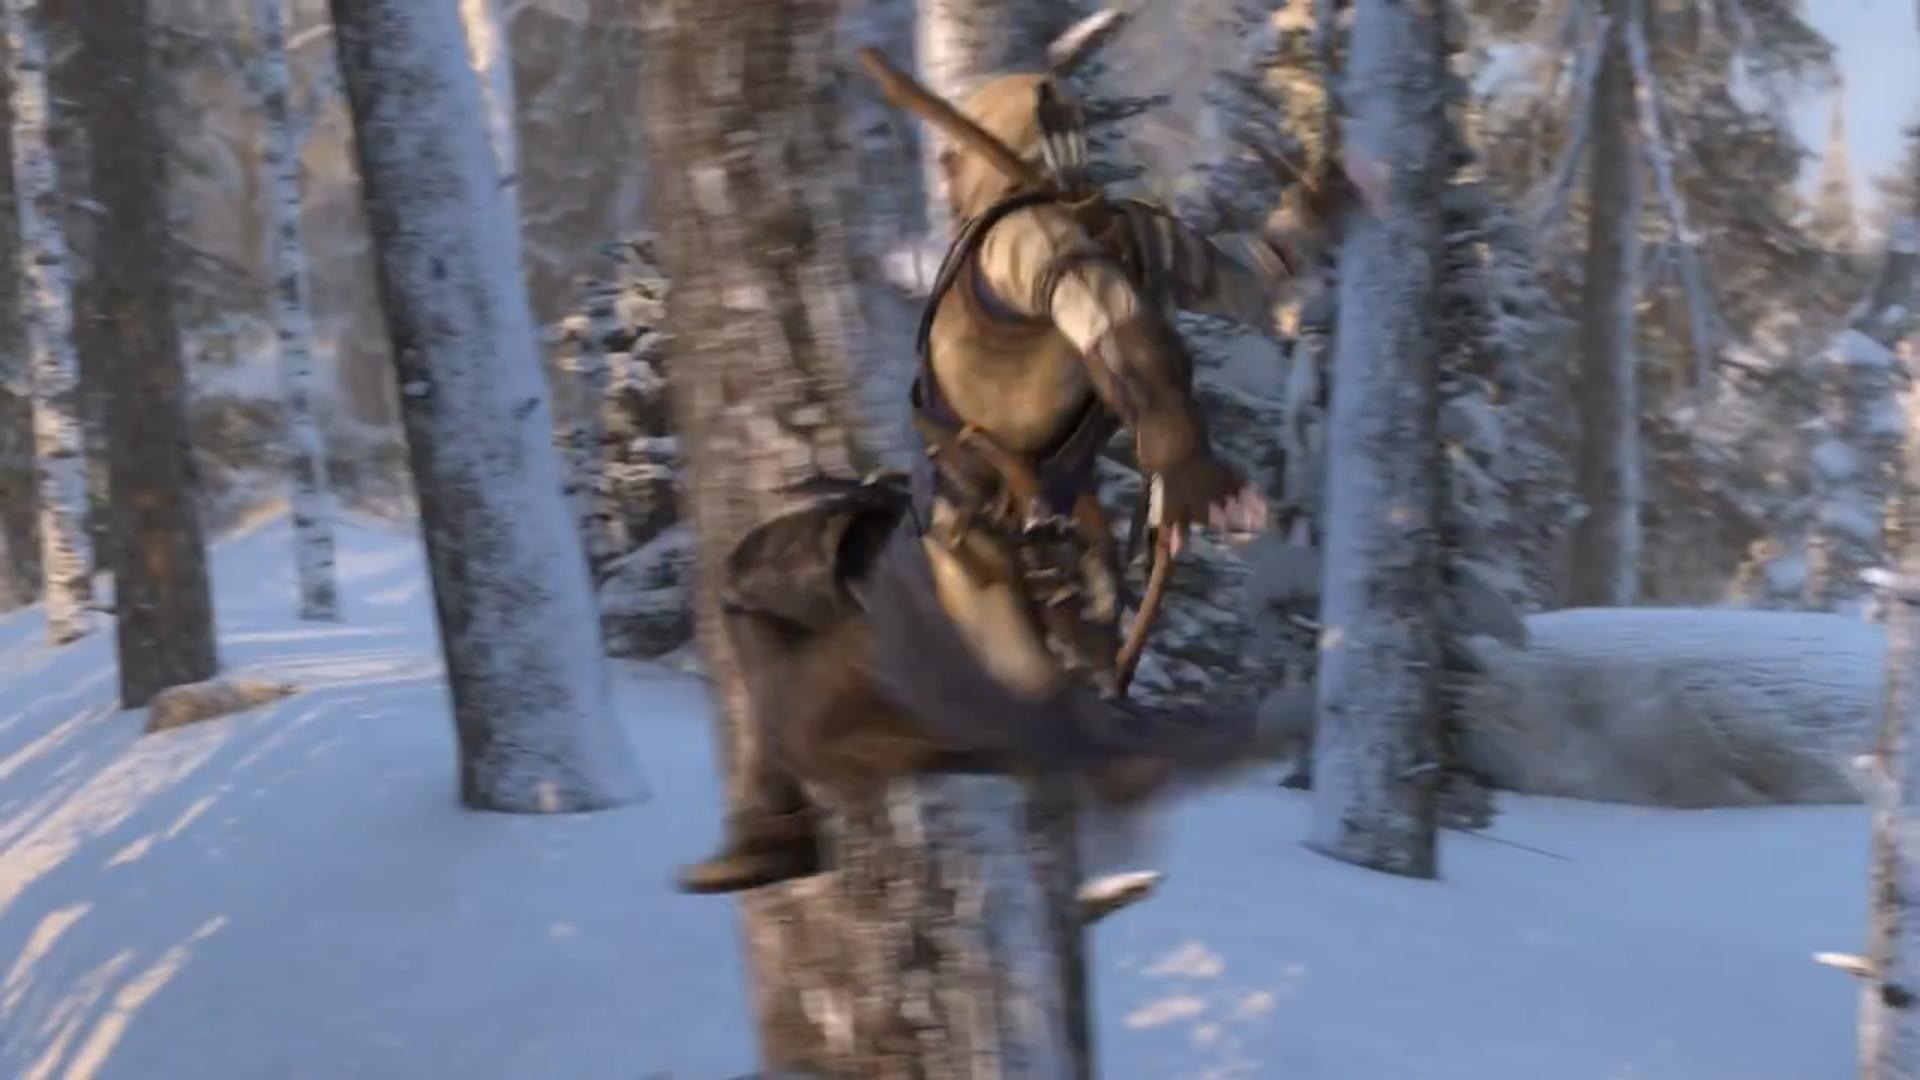 Assassin's Creed 3 - Rozbor prvního traileru 61683